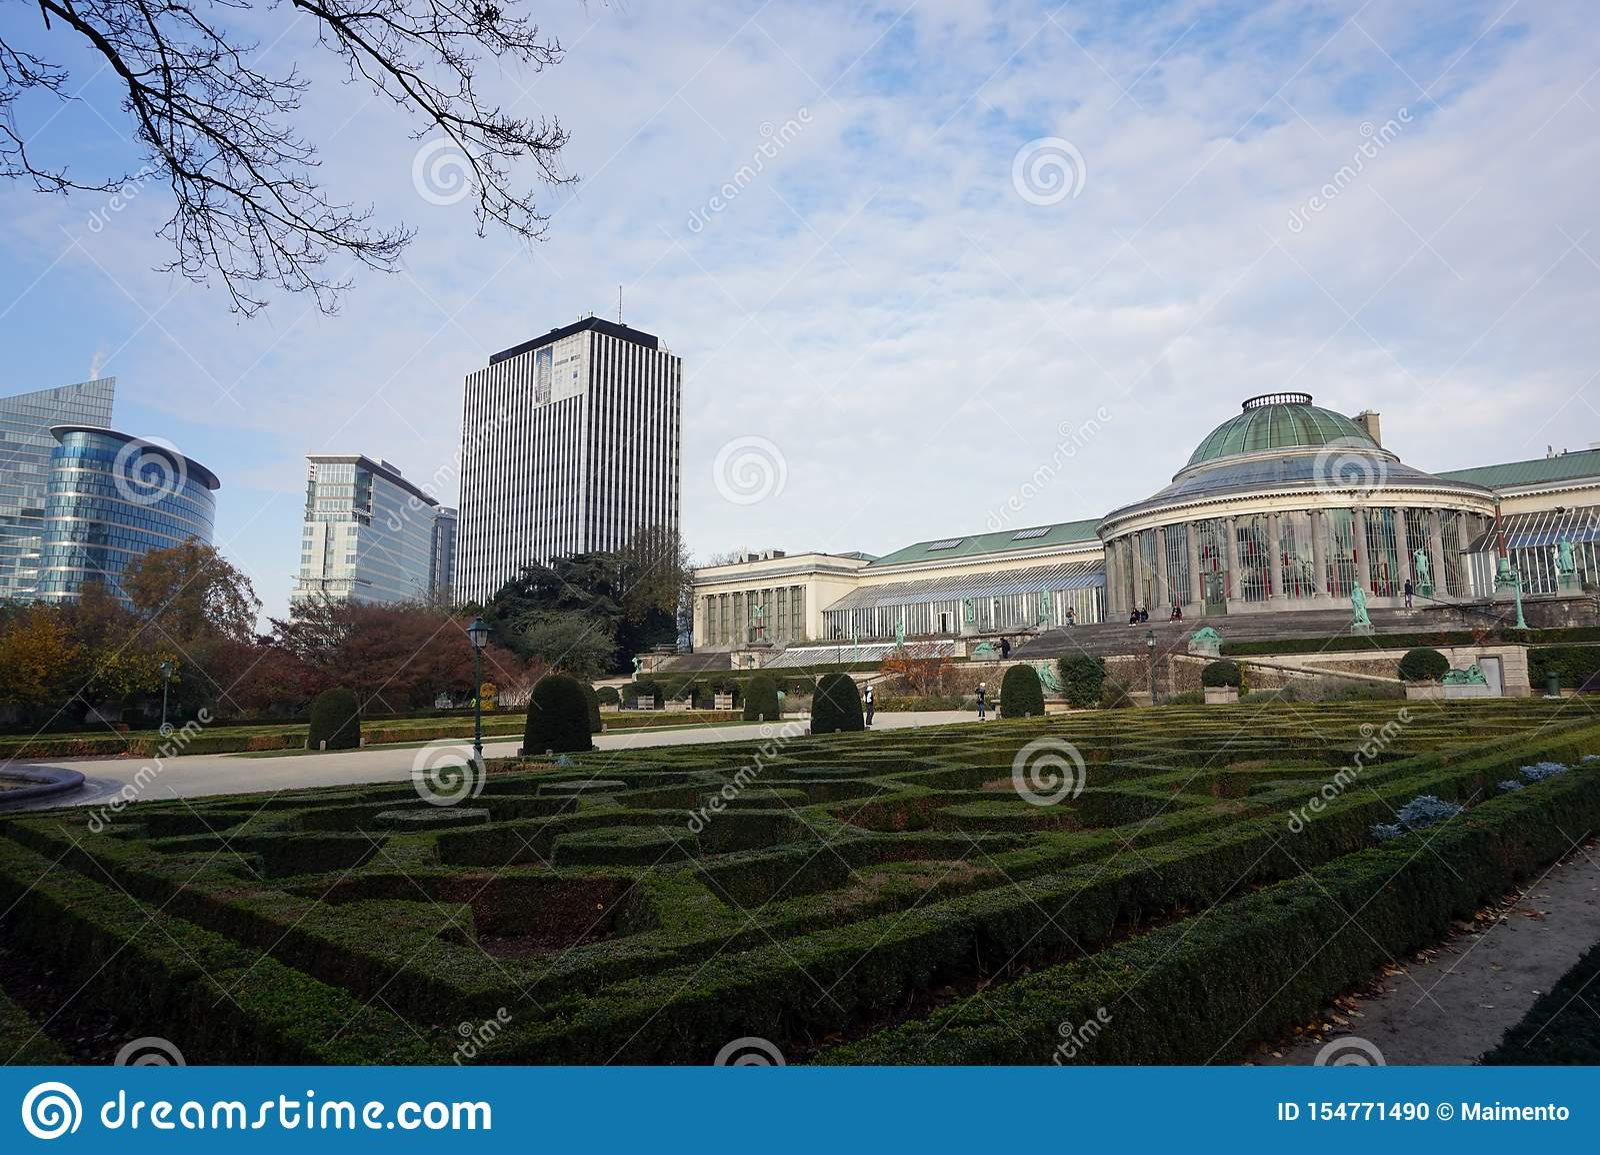 The Botanical Garden of Brussels